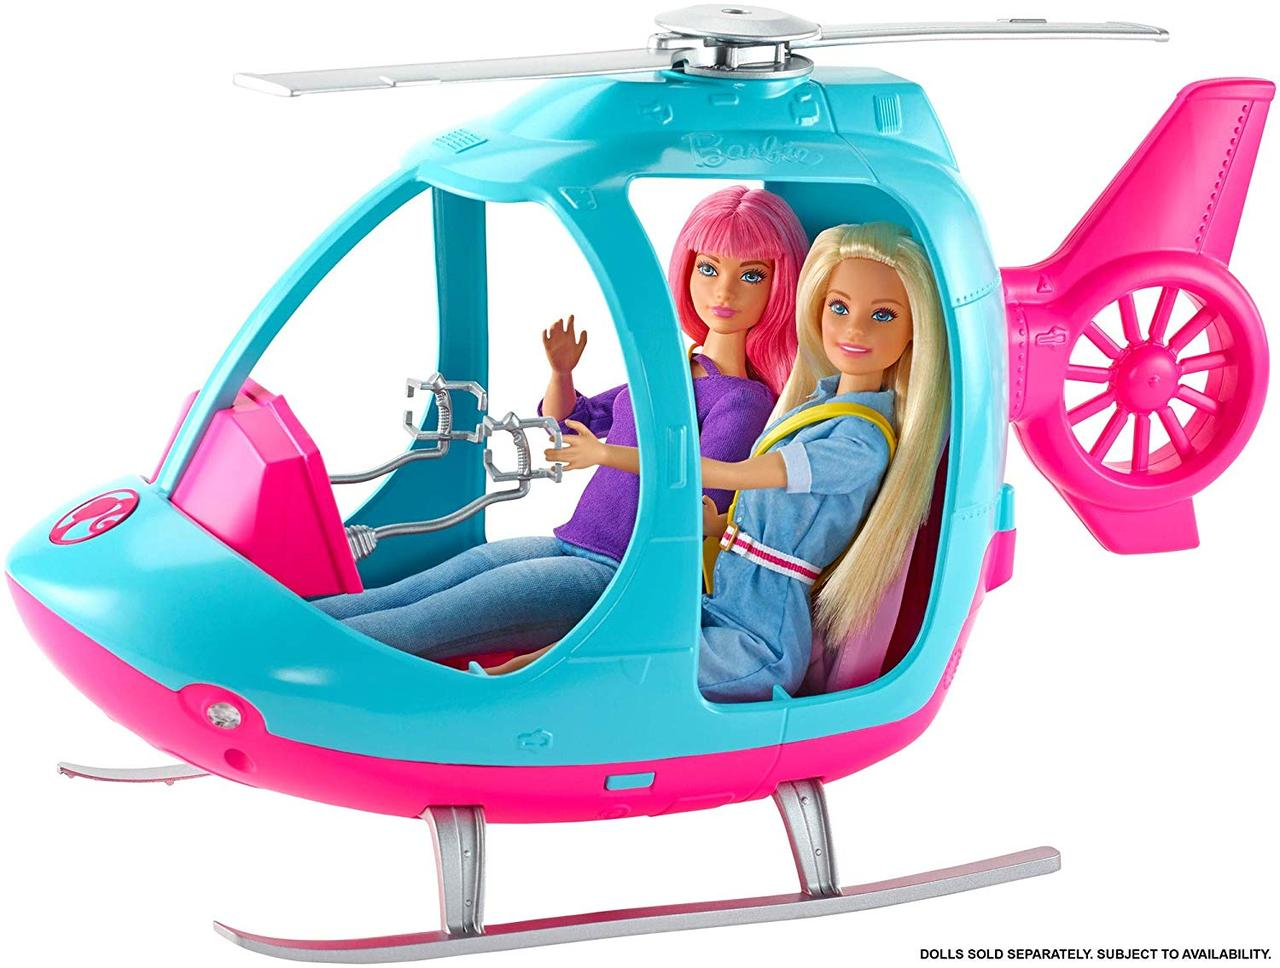 Барби Туристический вертолет Путешествия Barbie Helicopter Pink and Blue with Spinning Rotor